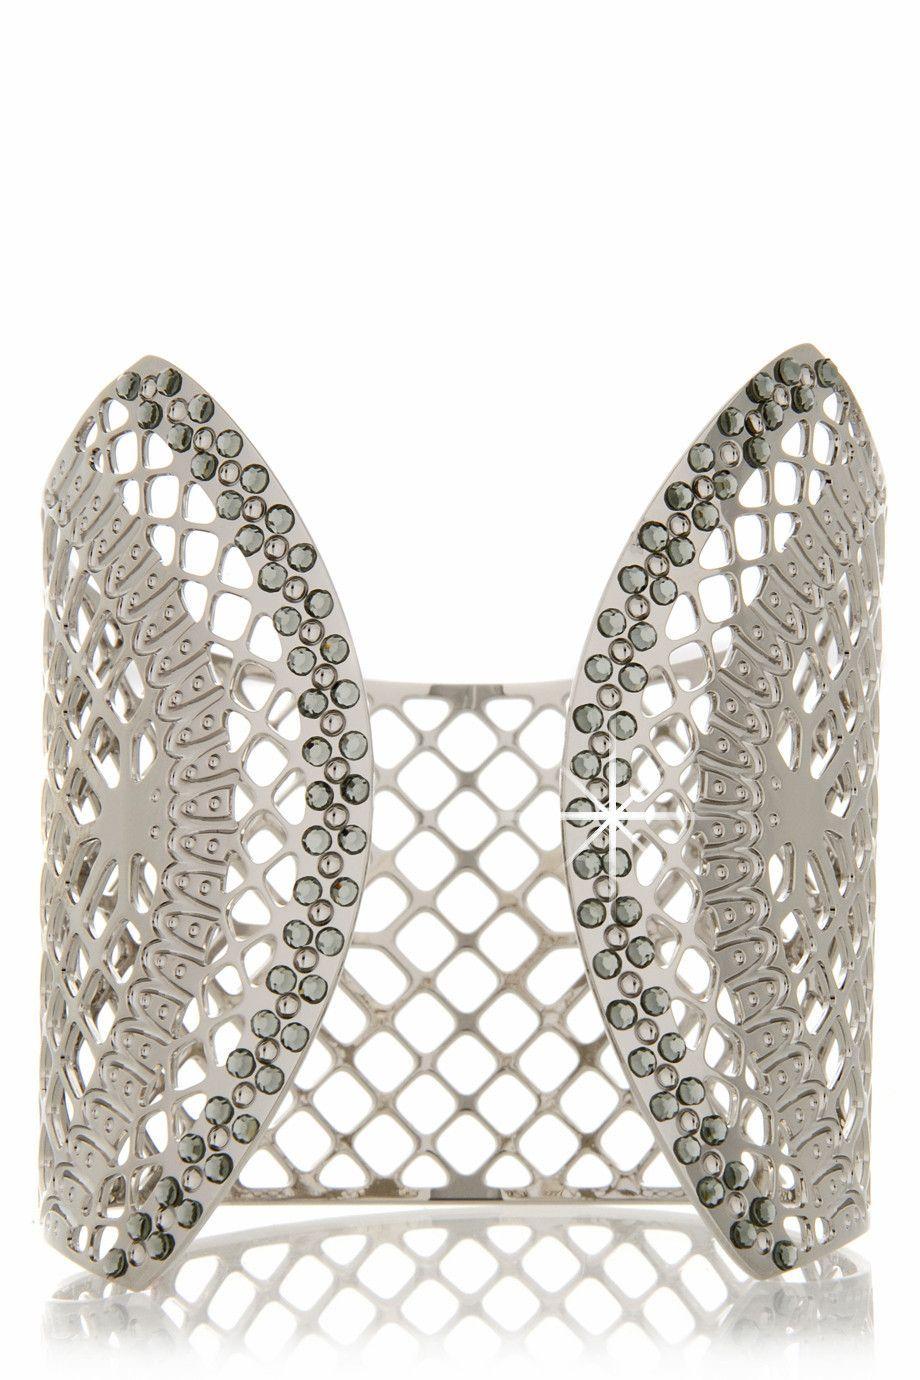 LK DESIGNS GWENORE Silver Lace Cuff